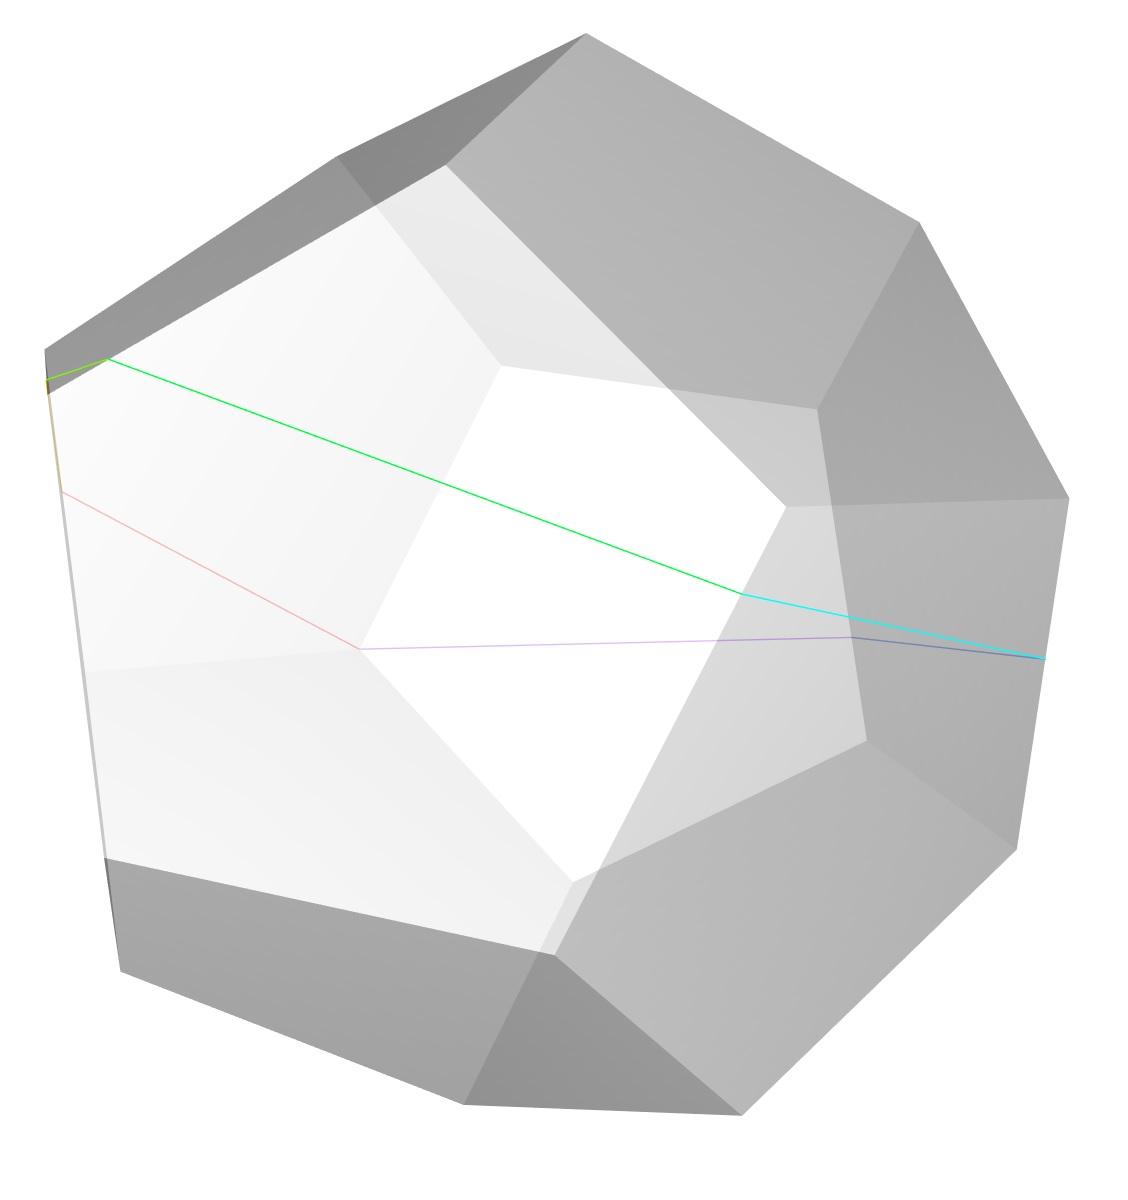 DodecahedronAnimation